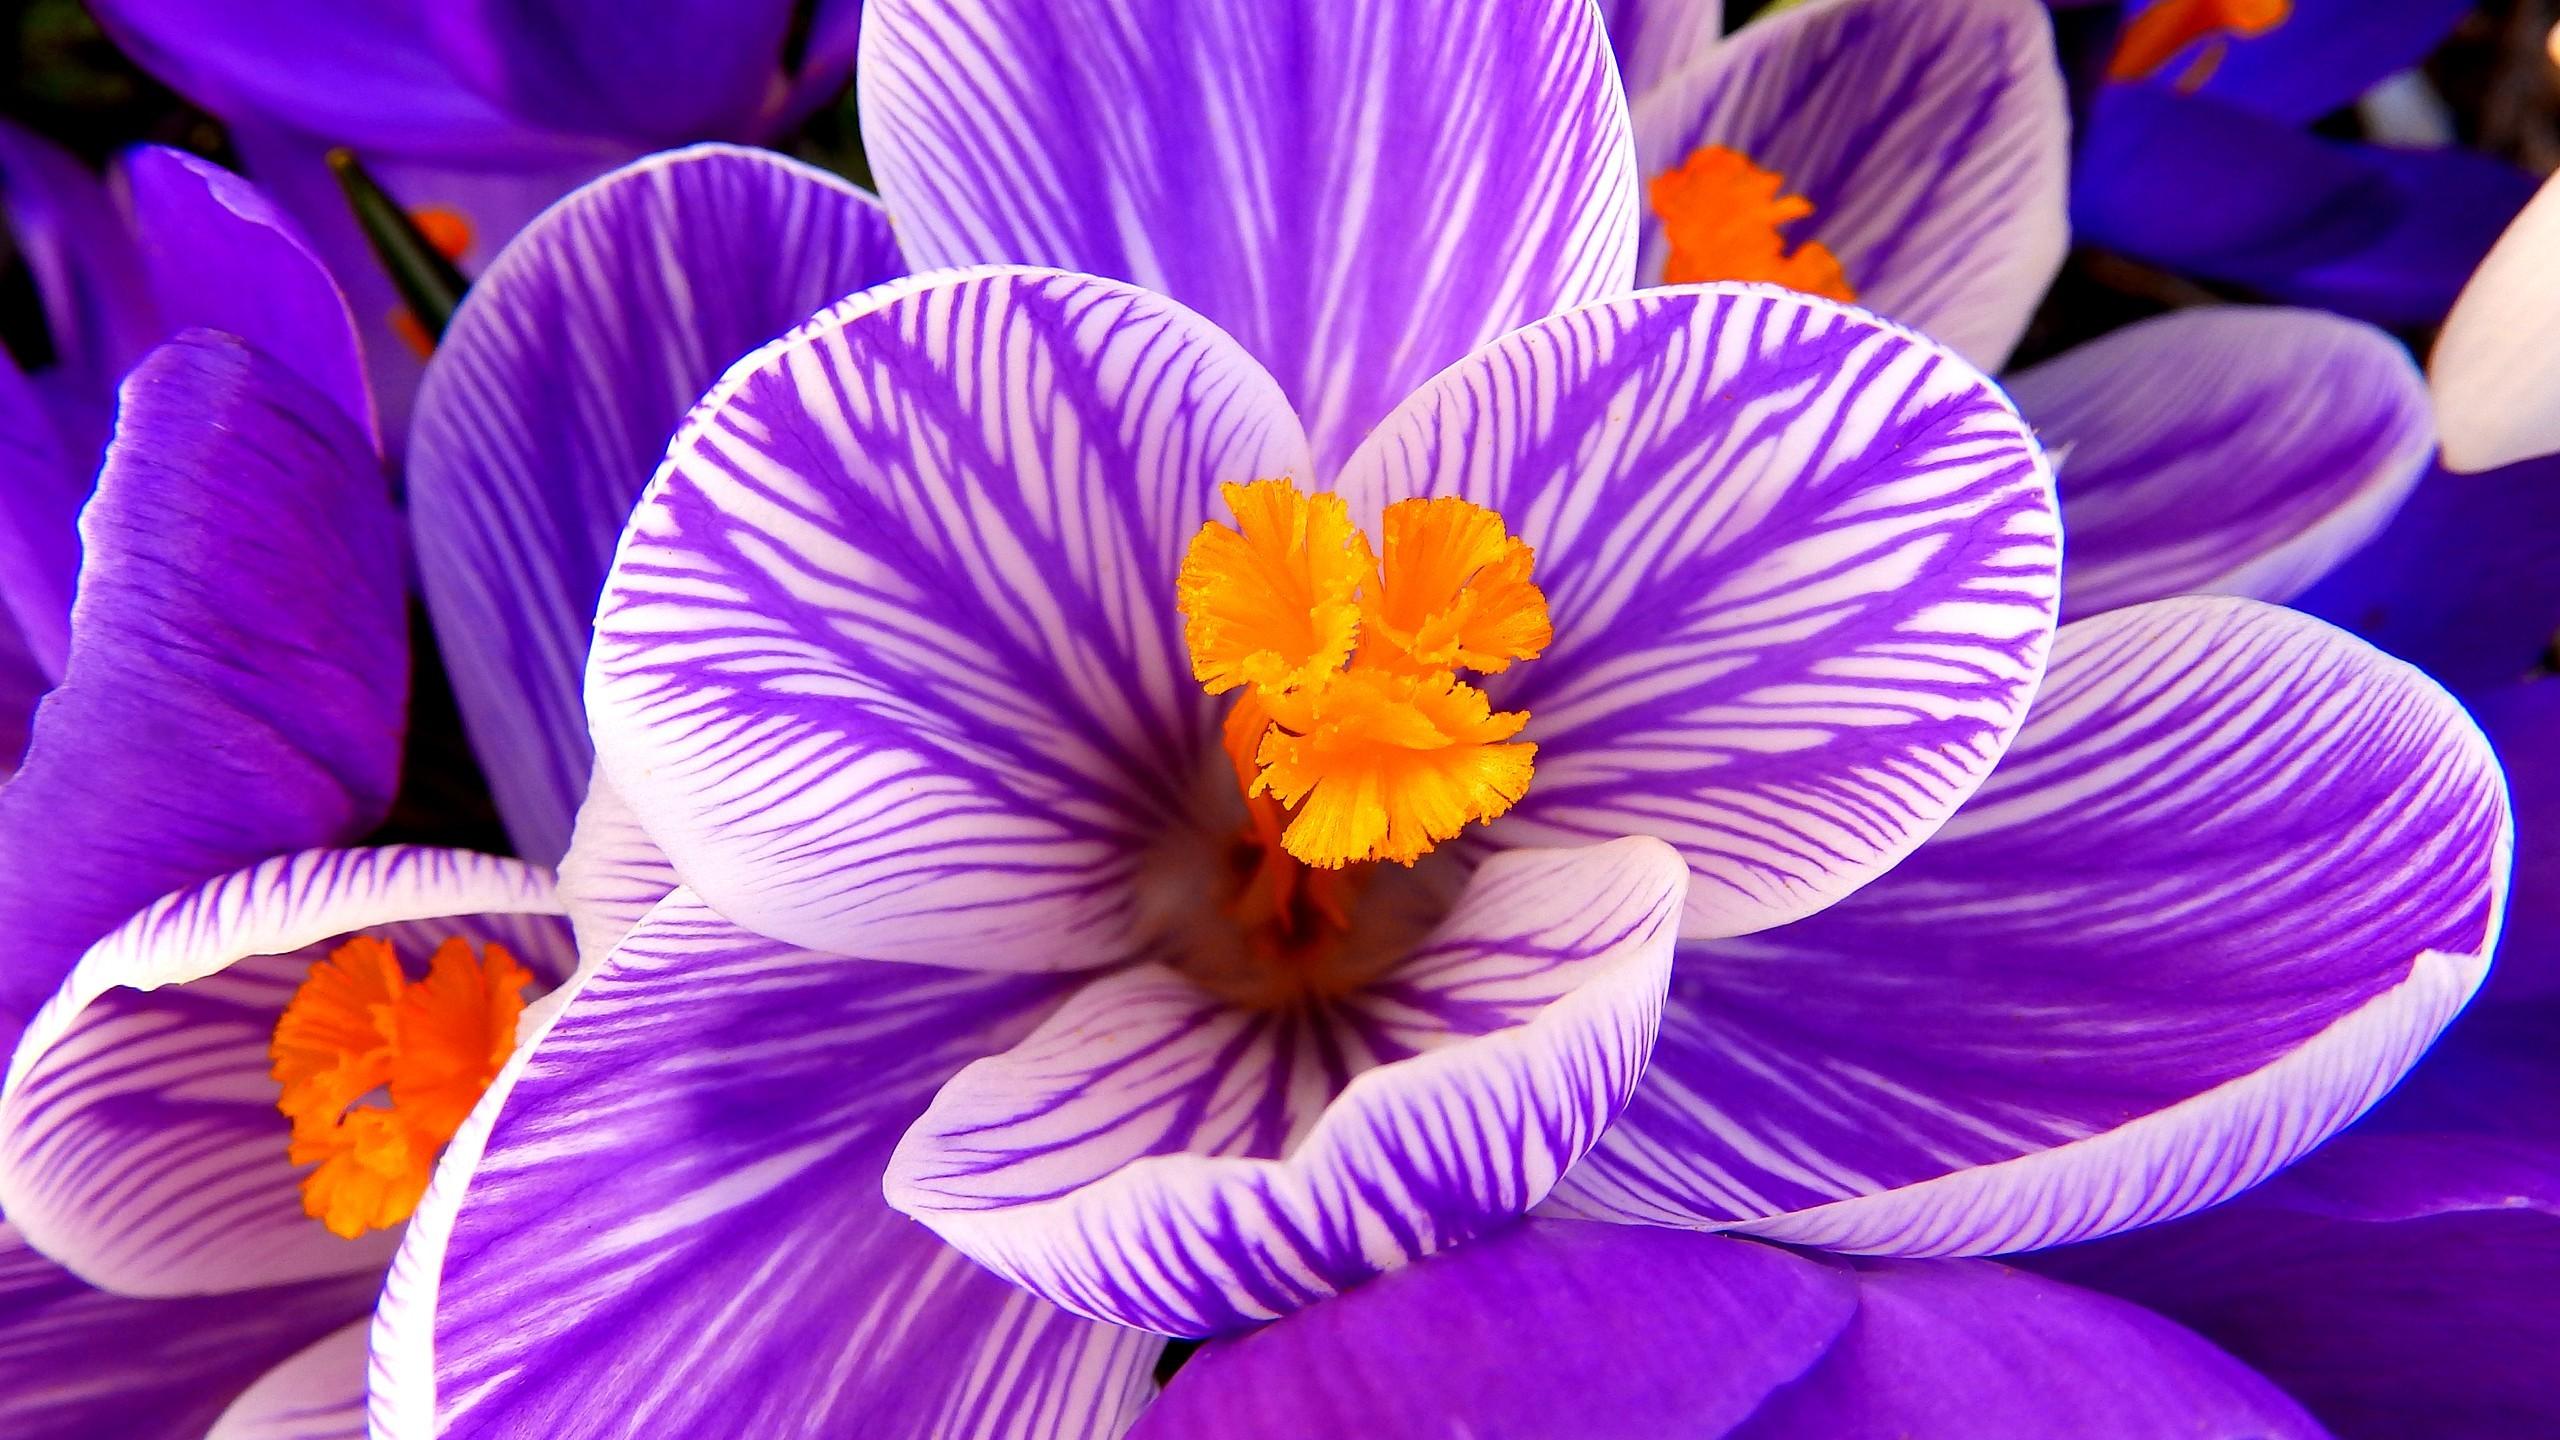 Funny Purple Flowers Hd Wallpaper: Purple Flowers Wallpapers (76+ Images